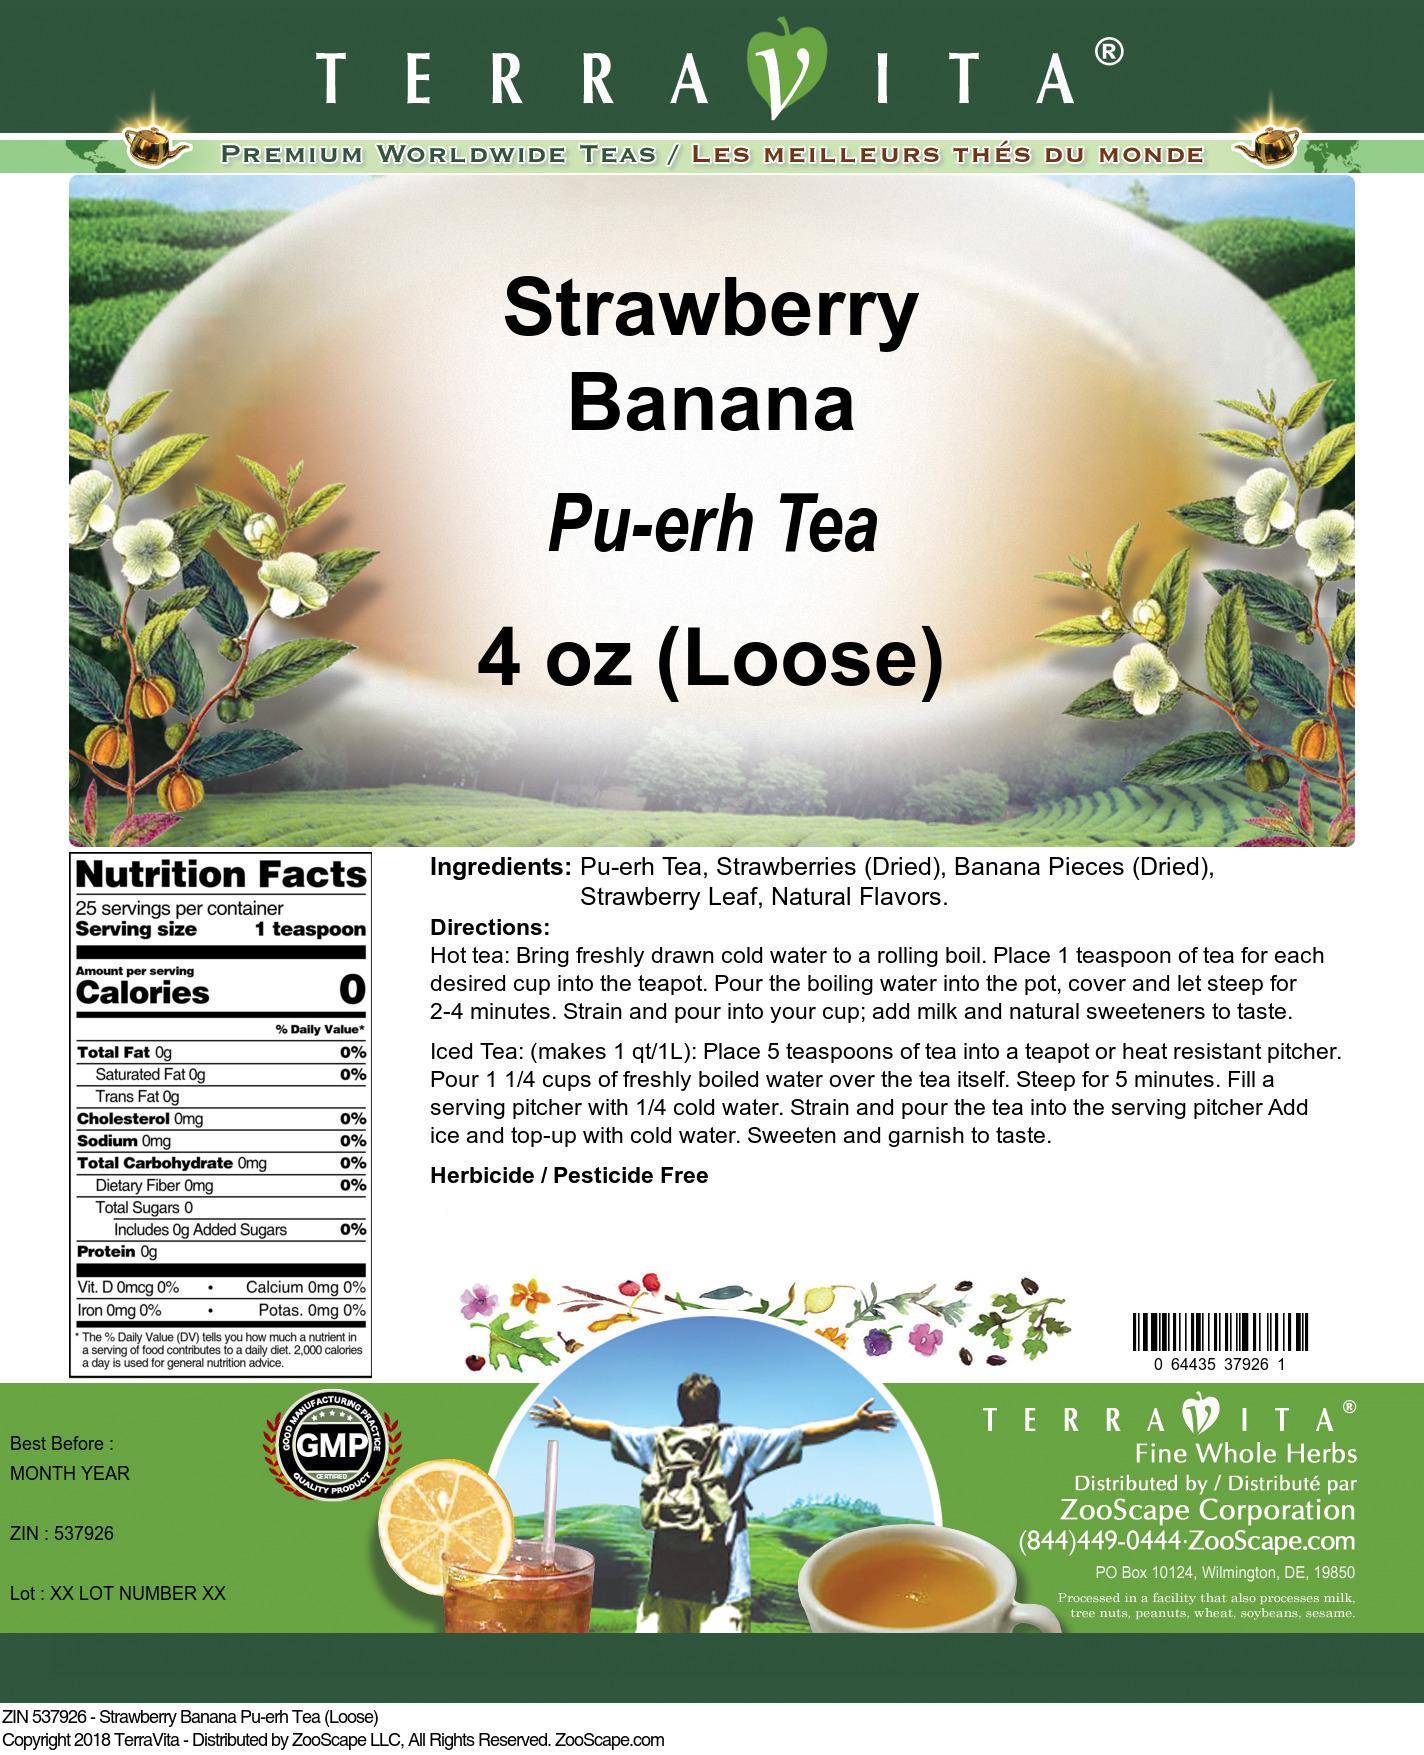 Strawberry Banana Pu-erh Tea (Loose)